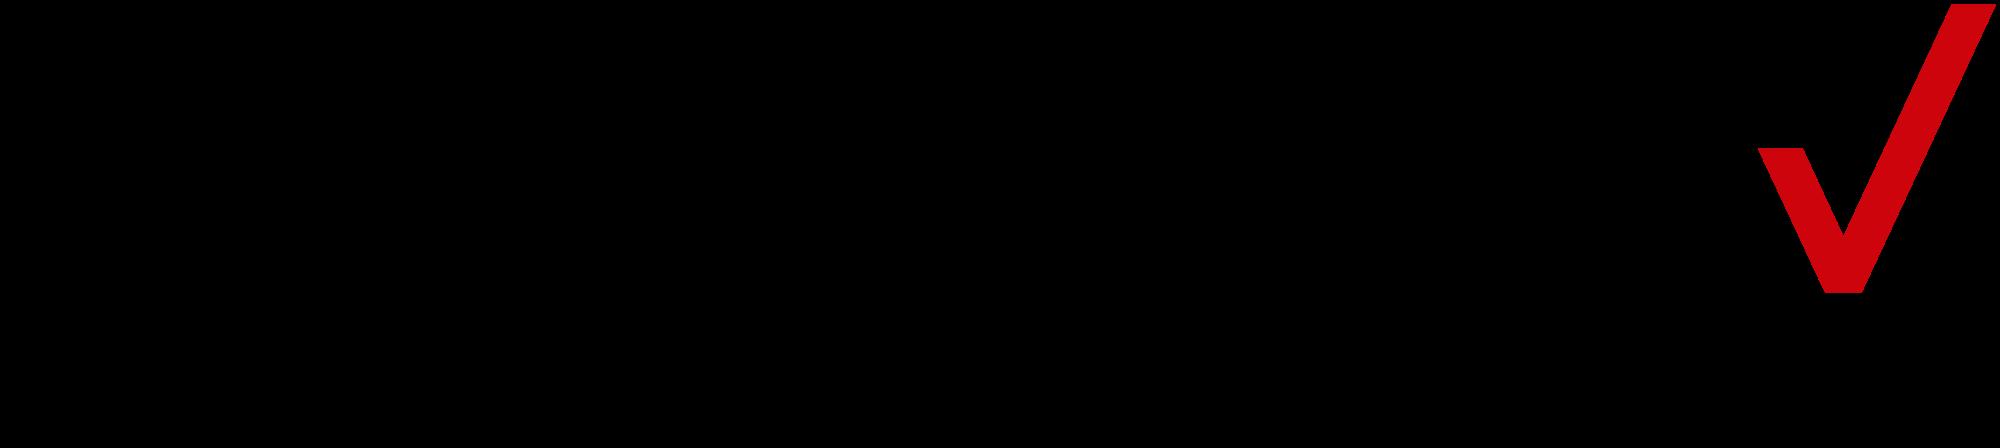 Verizon 2015 Logo Vector PNG